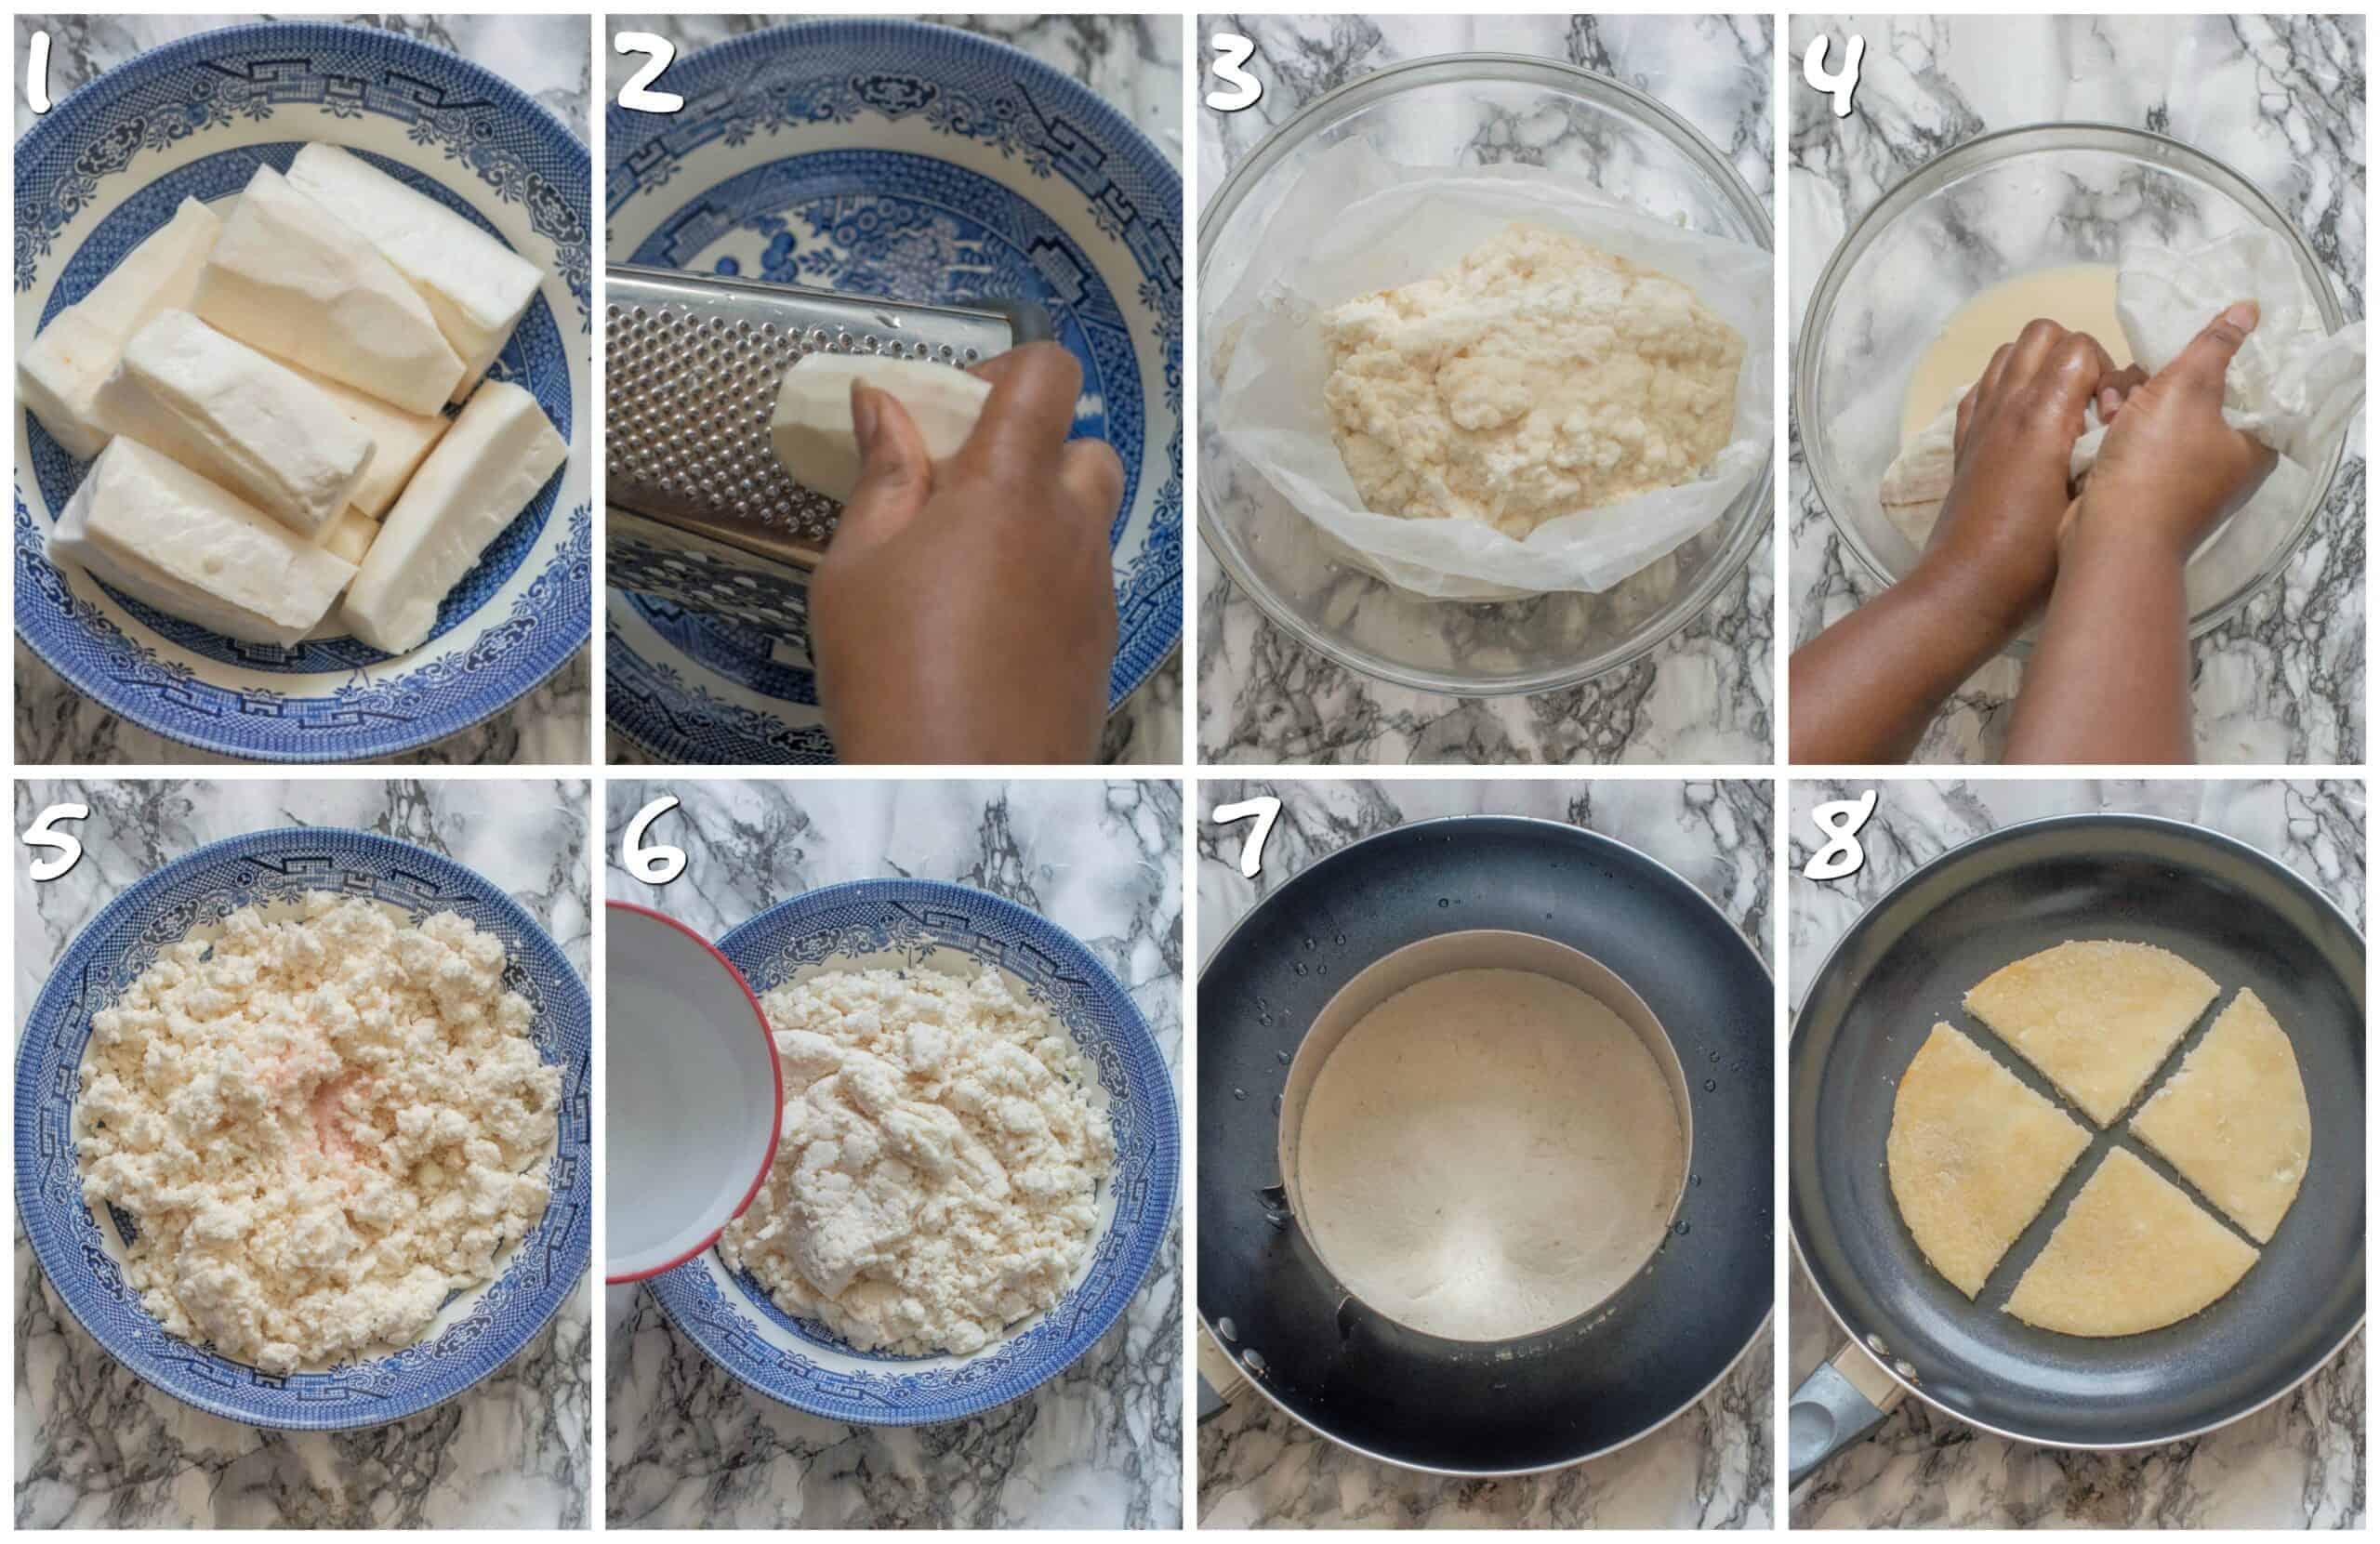 steps 1-8 making the bammy